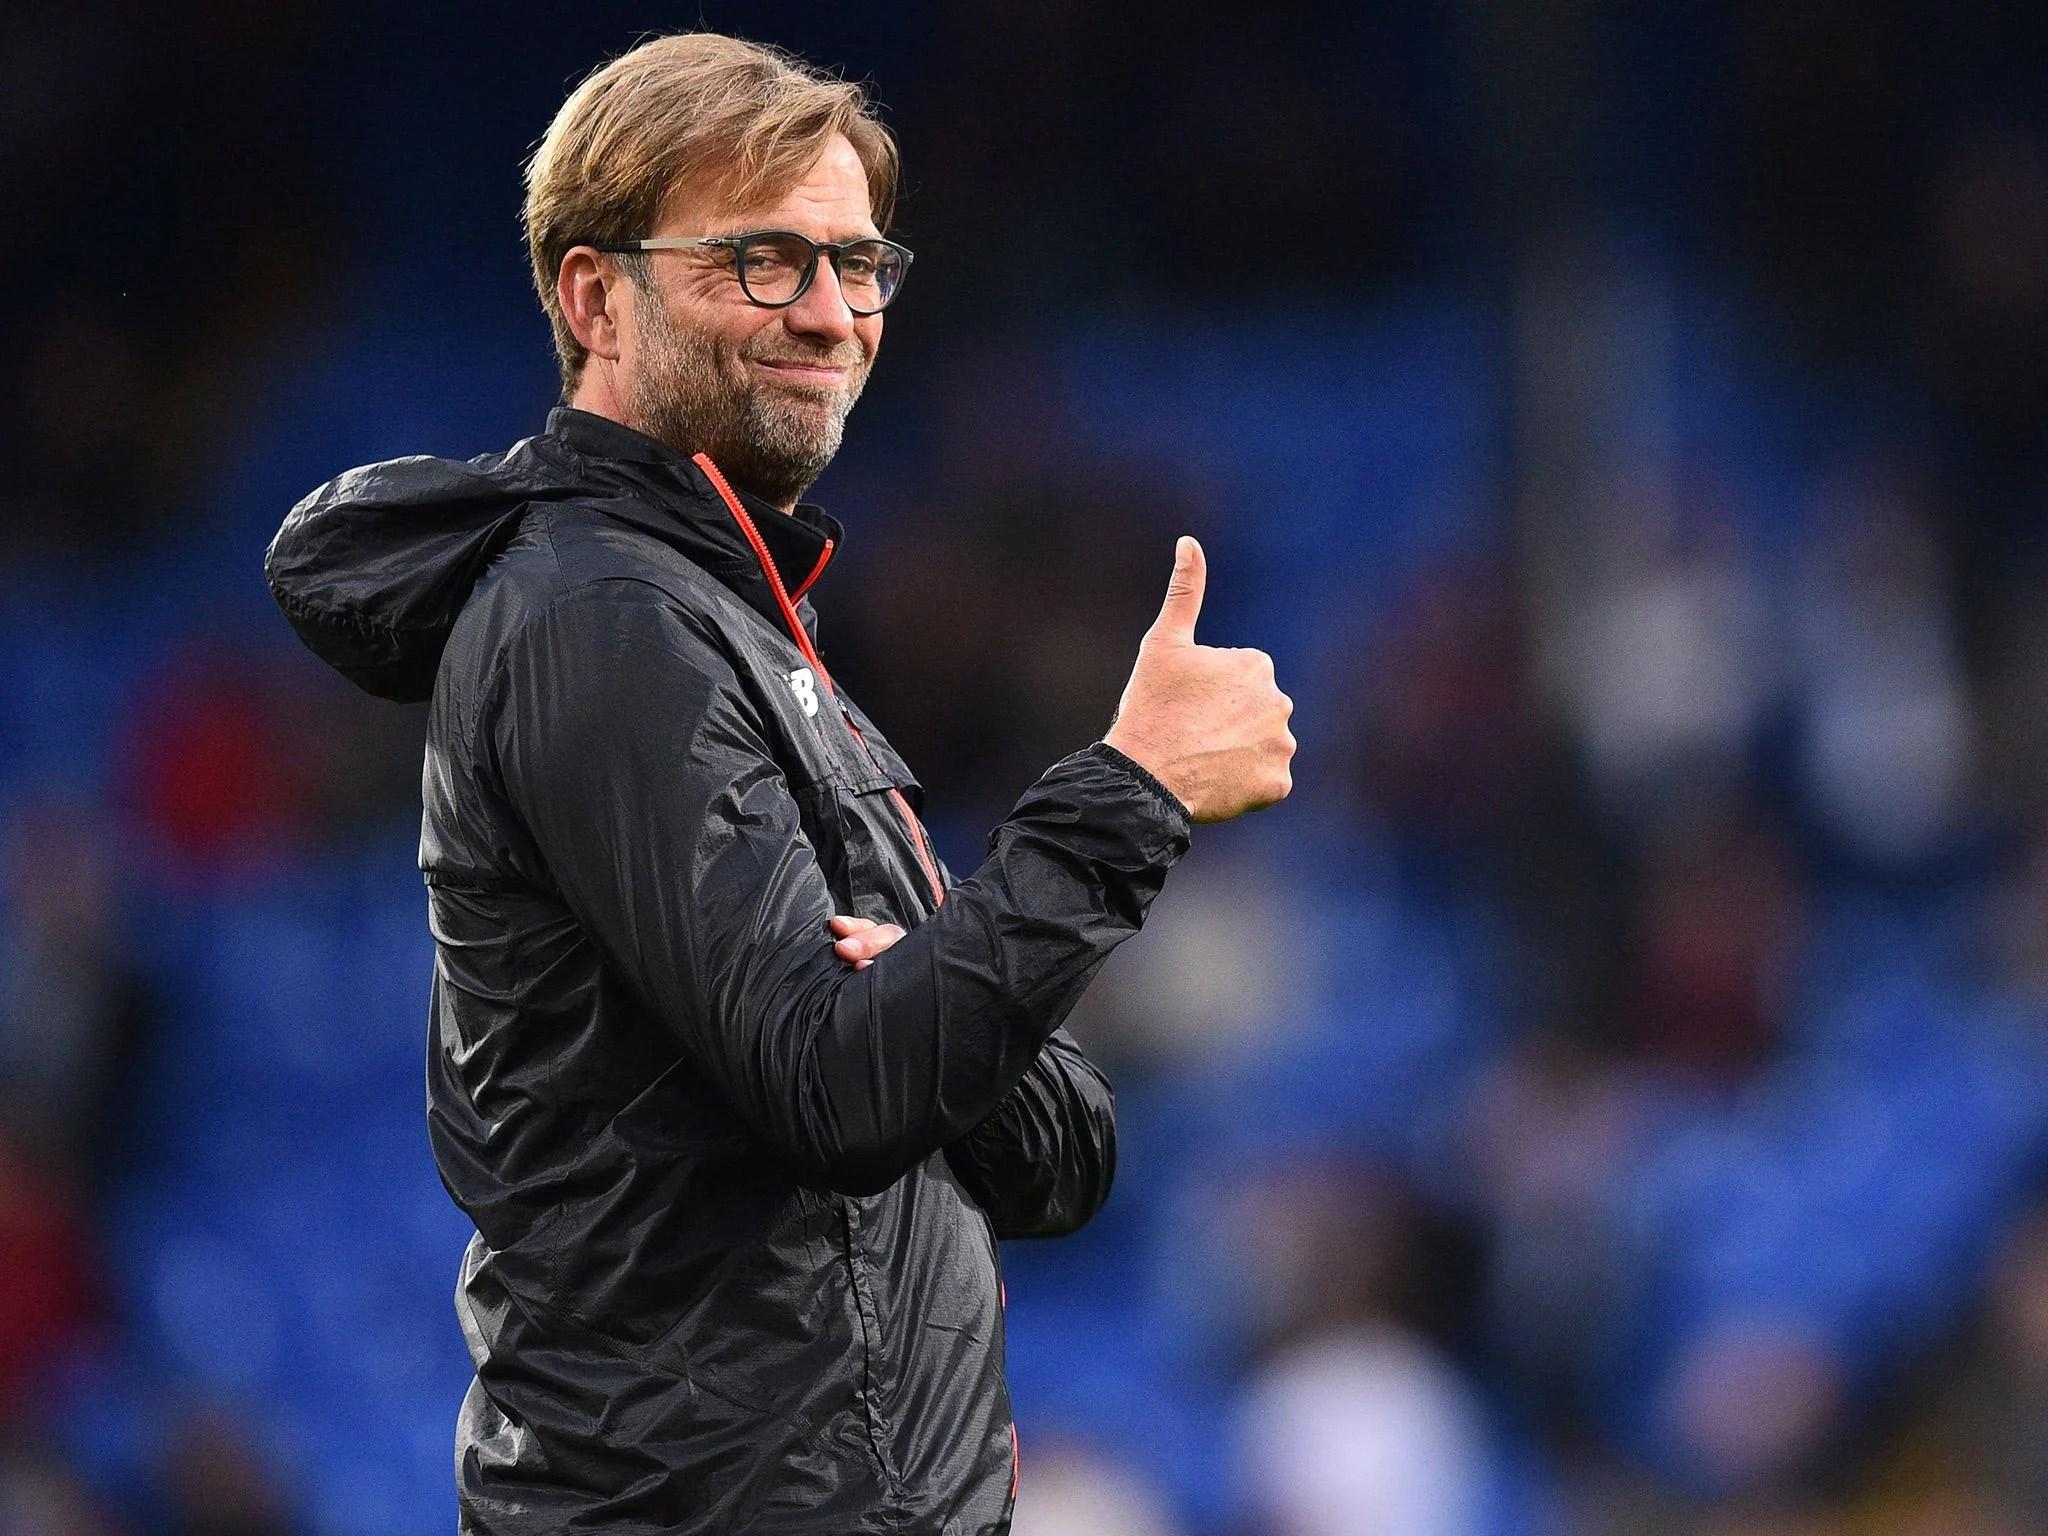 Wayne Rooney Liverpool Manager Jurgen Klopp Recalls Being